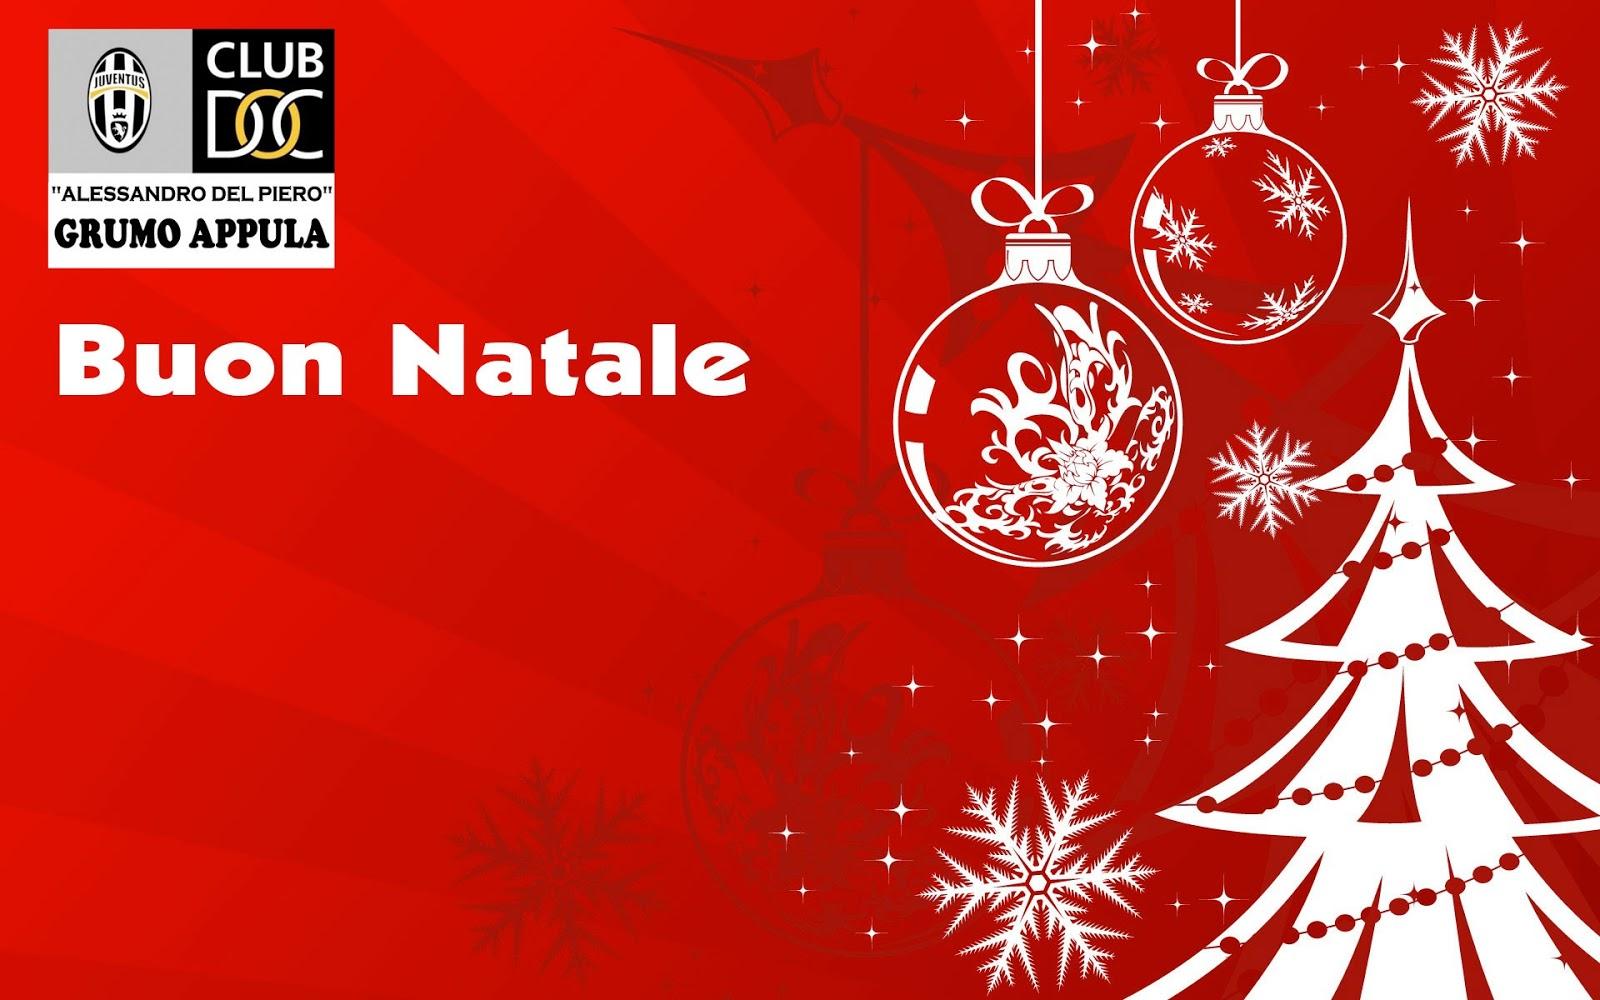 Auguri Di Buon Natale Juve.Auguri Dallo Juventus Club Doc Grumo Appula